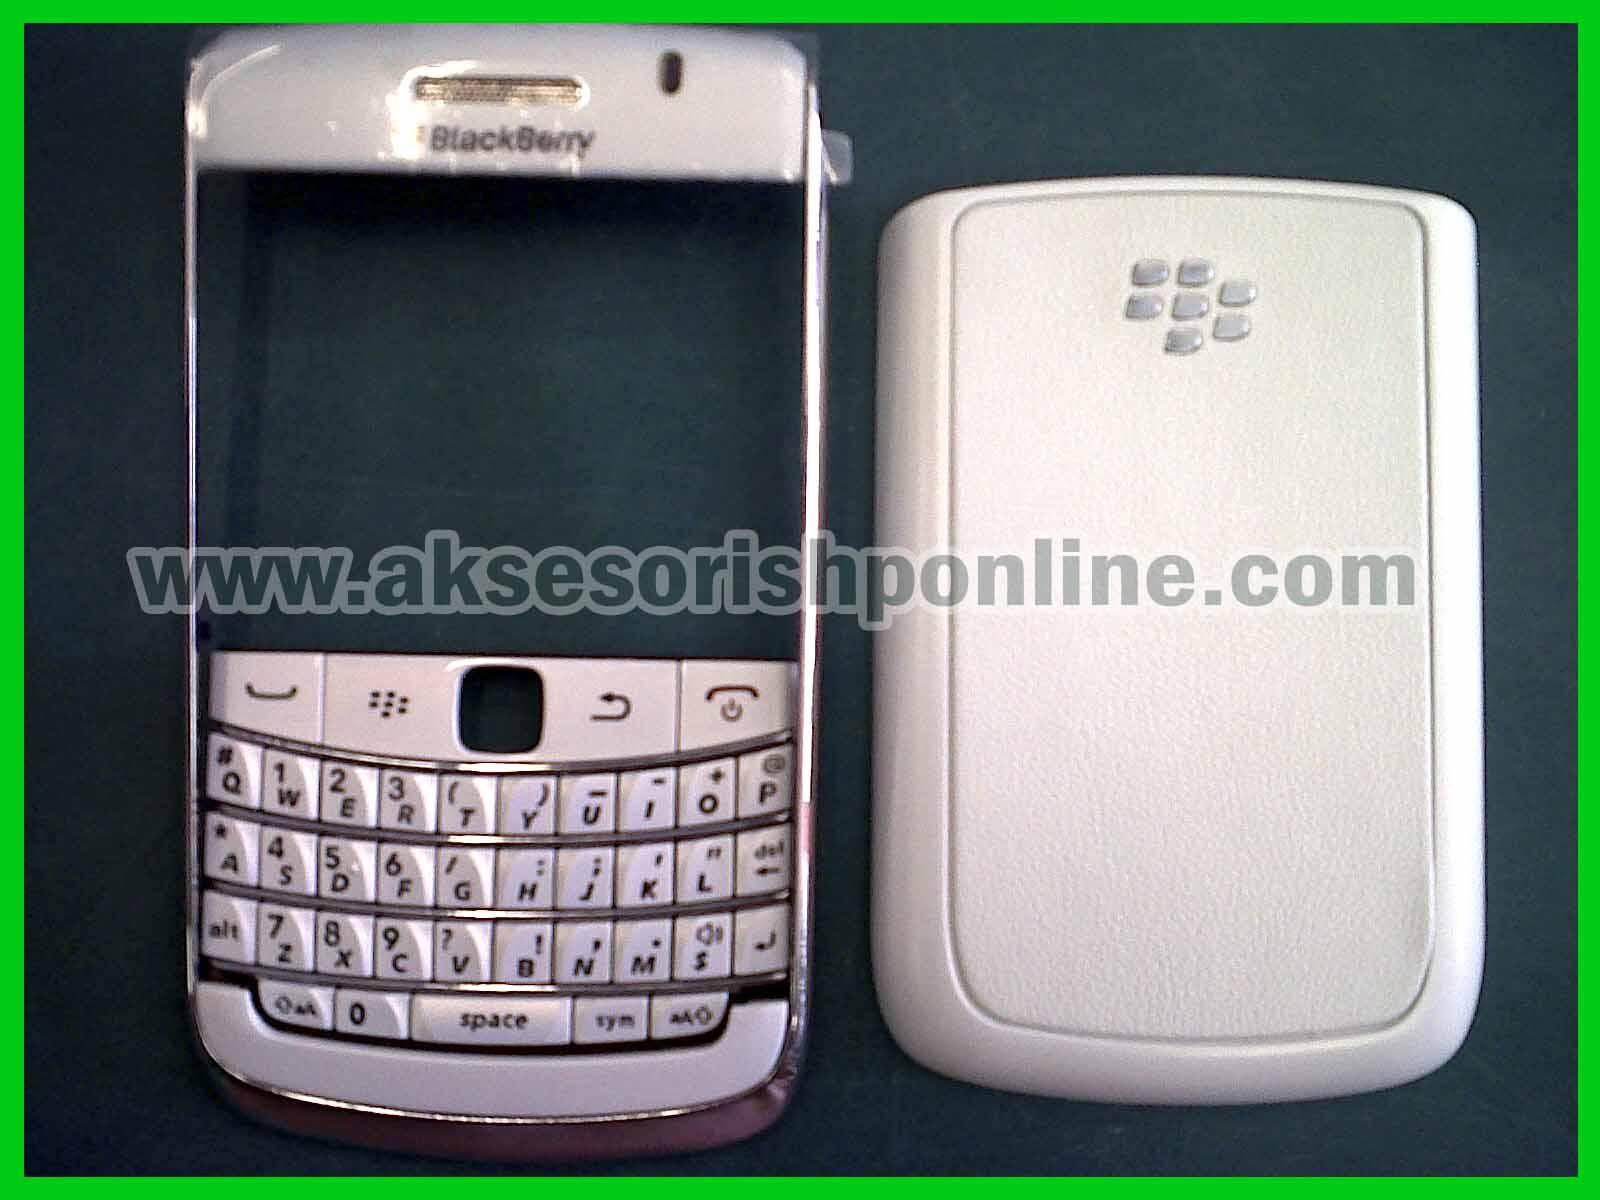 Aksesoris Hp Online Casing Blackberry 8520 Gemini Original White